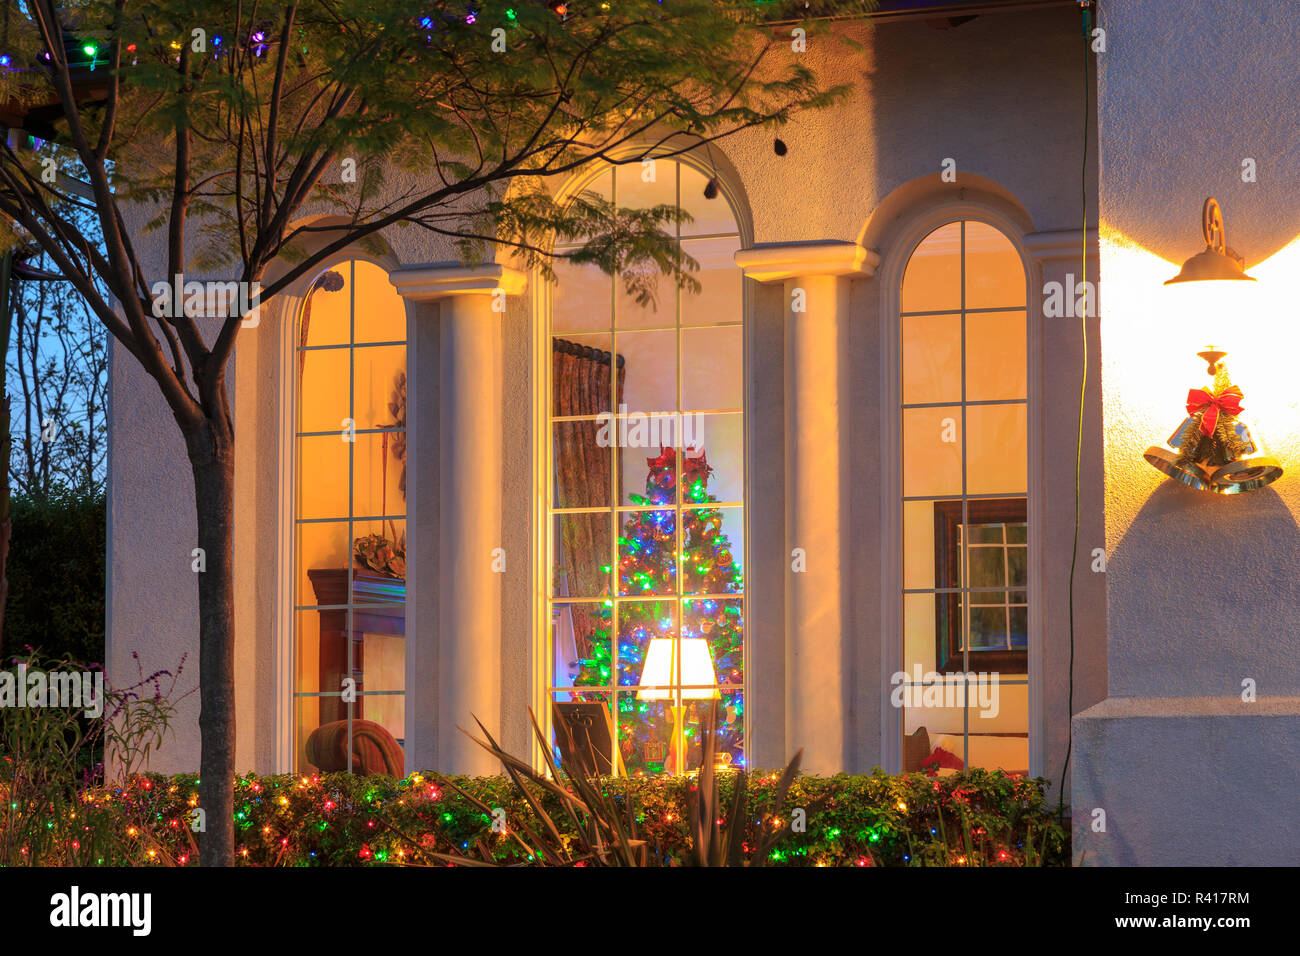 San Diego Christmas Lights.Home In Upscale Chula Vista Neighborhood With Christmas